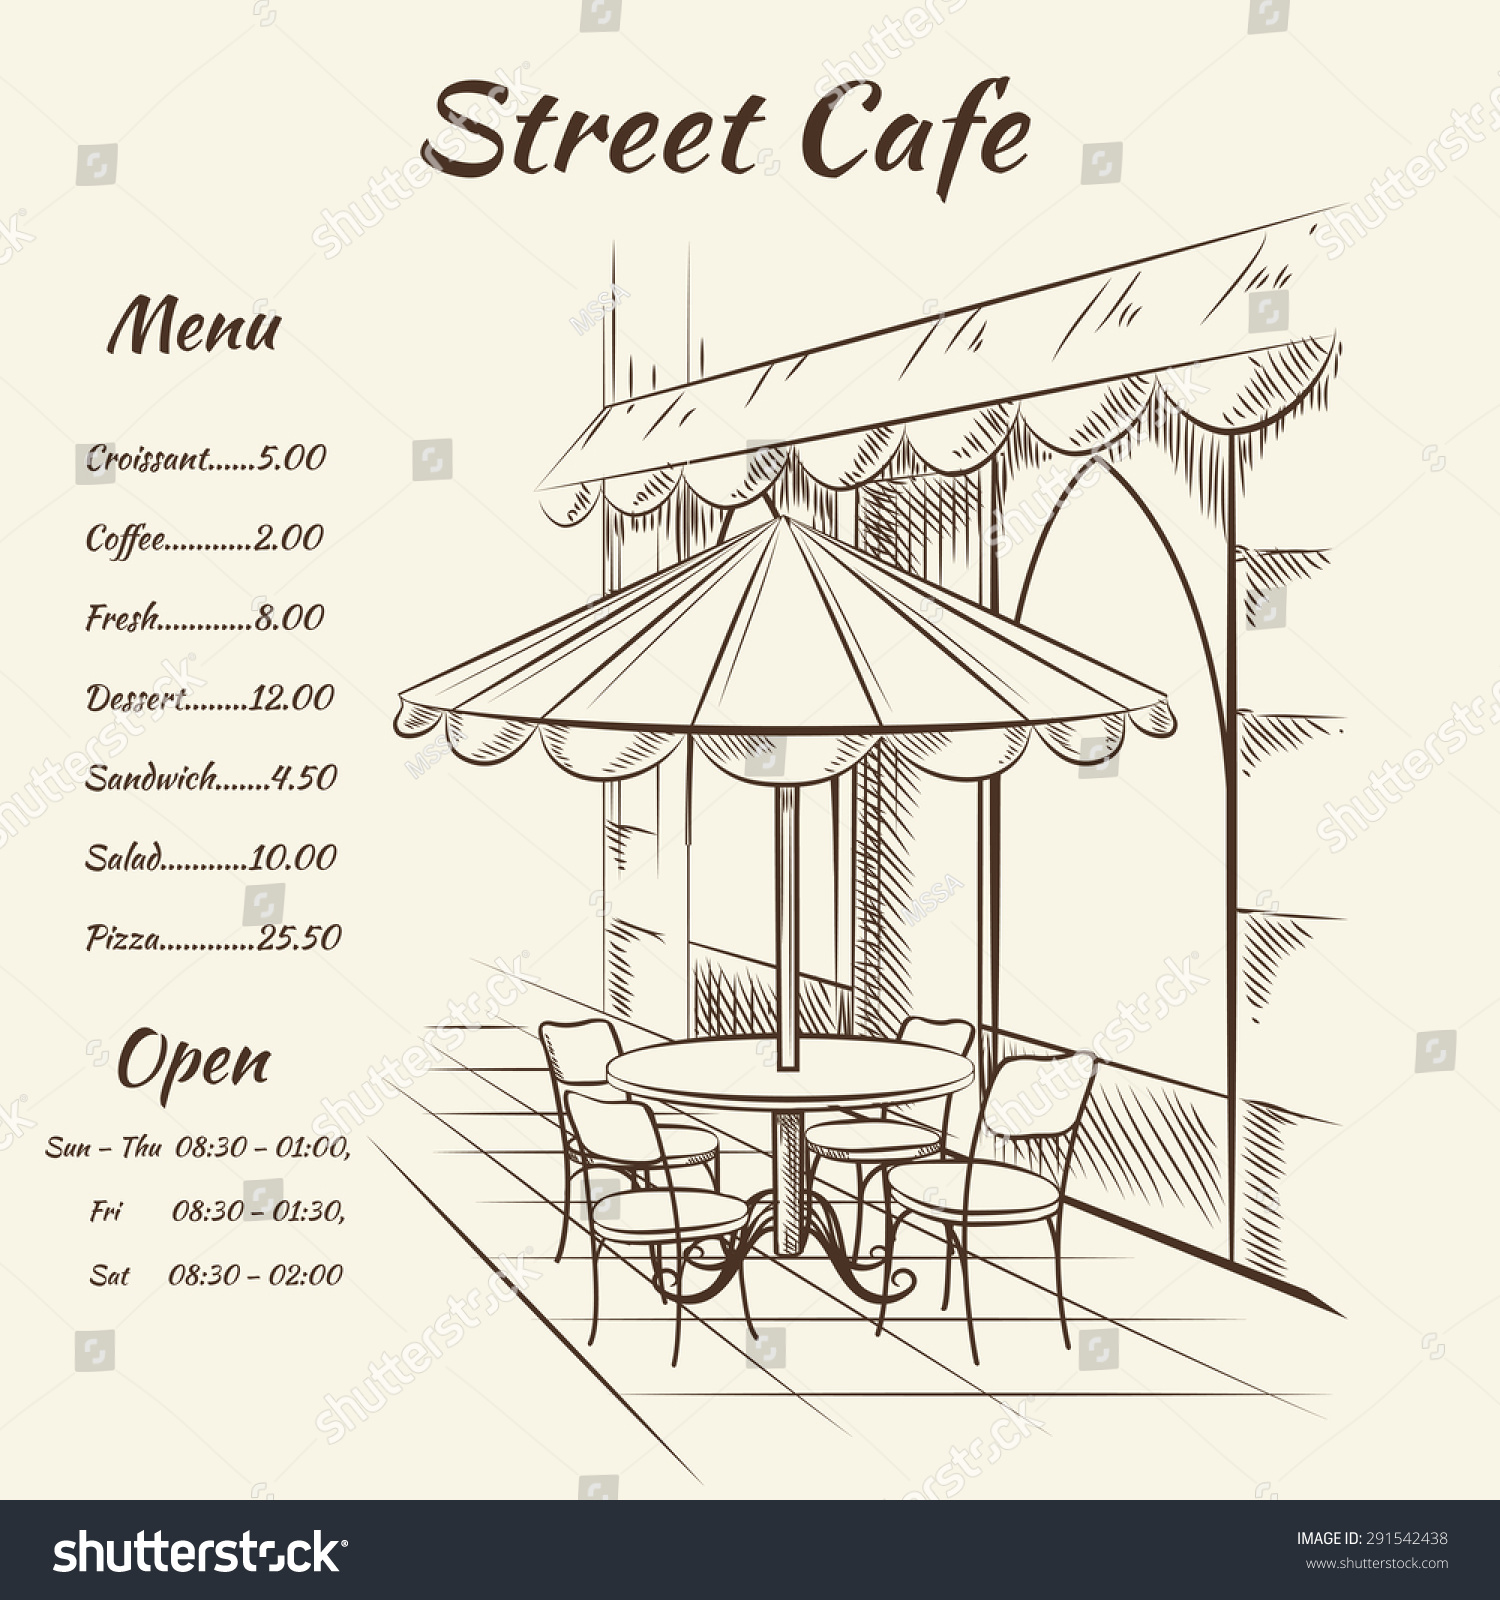 Hand Drawn Street Cafe Background. Menu Design, Sketch